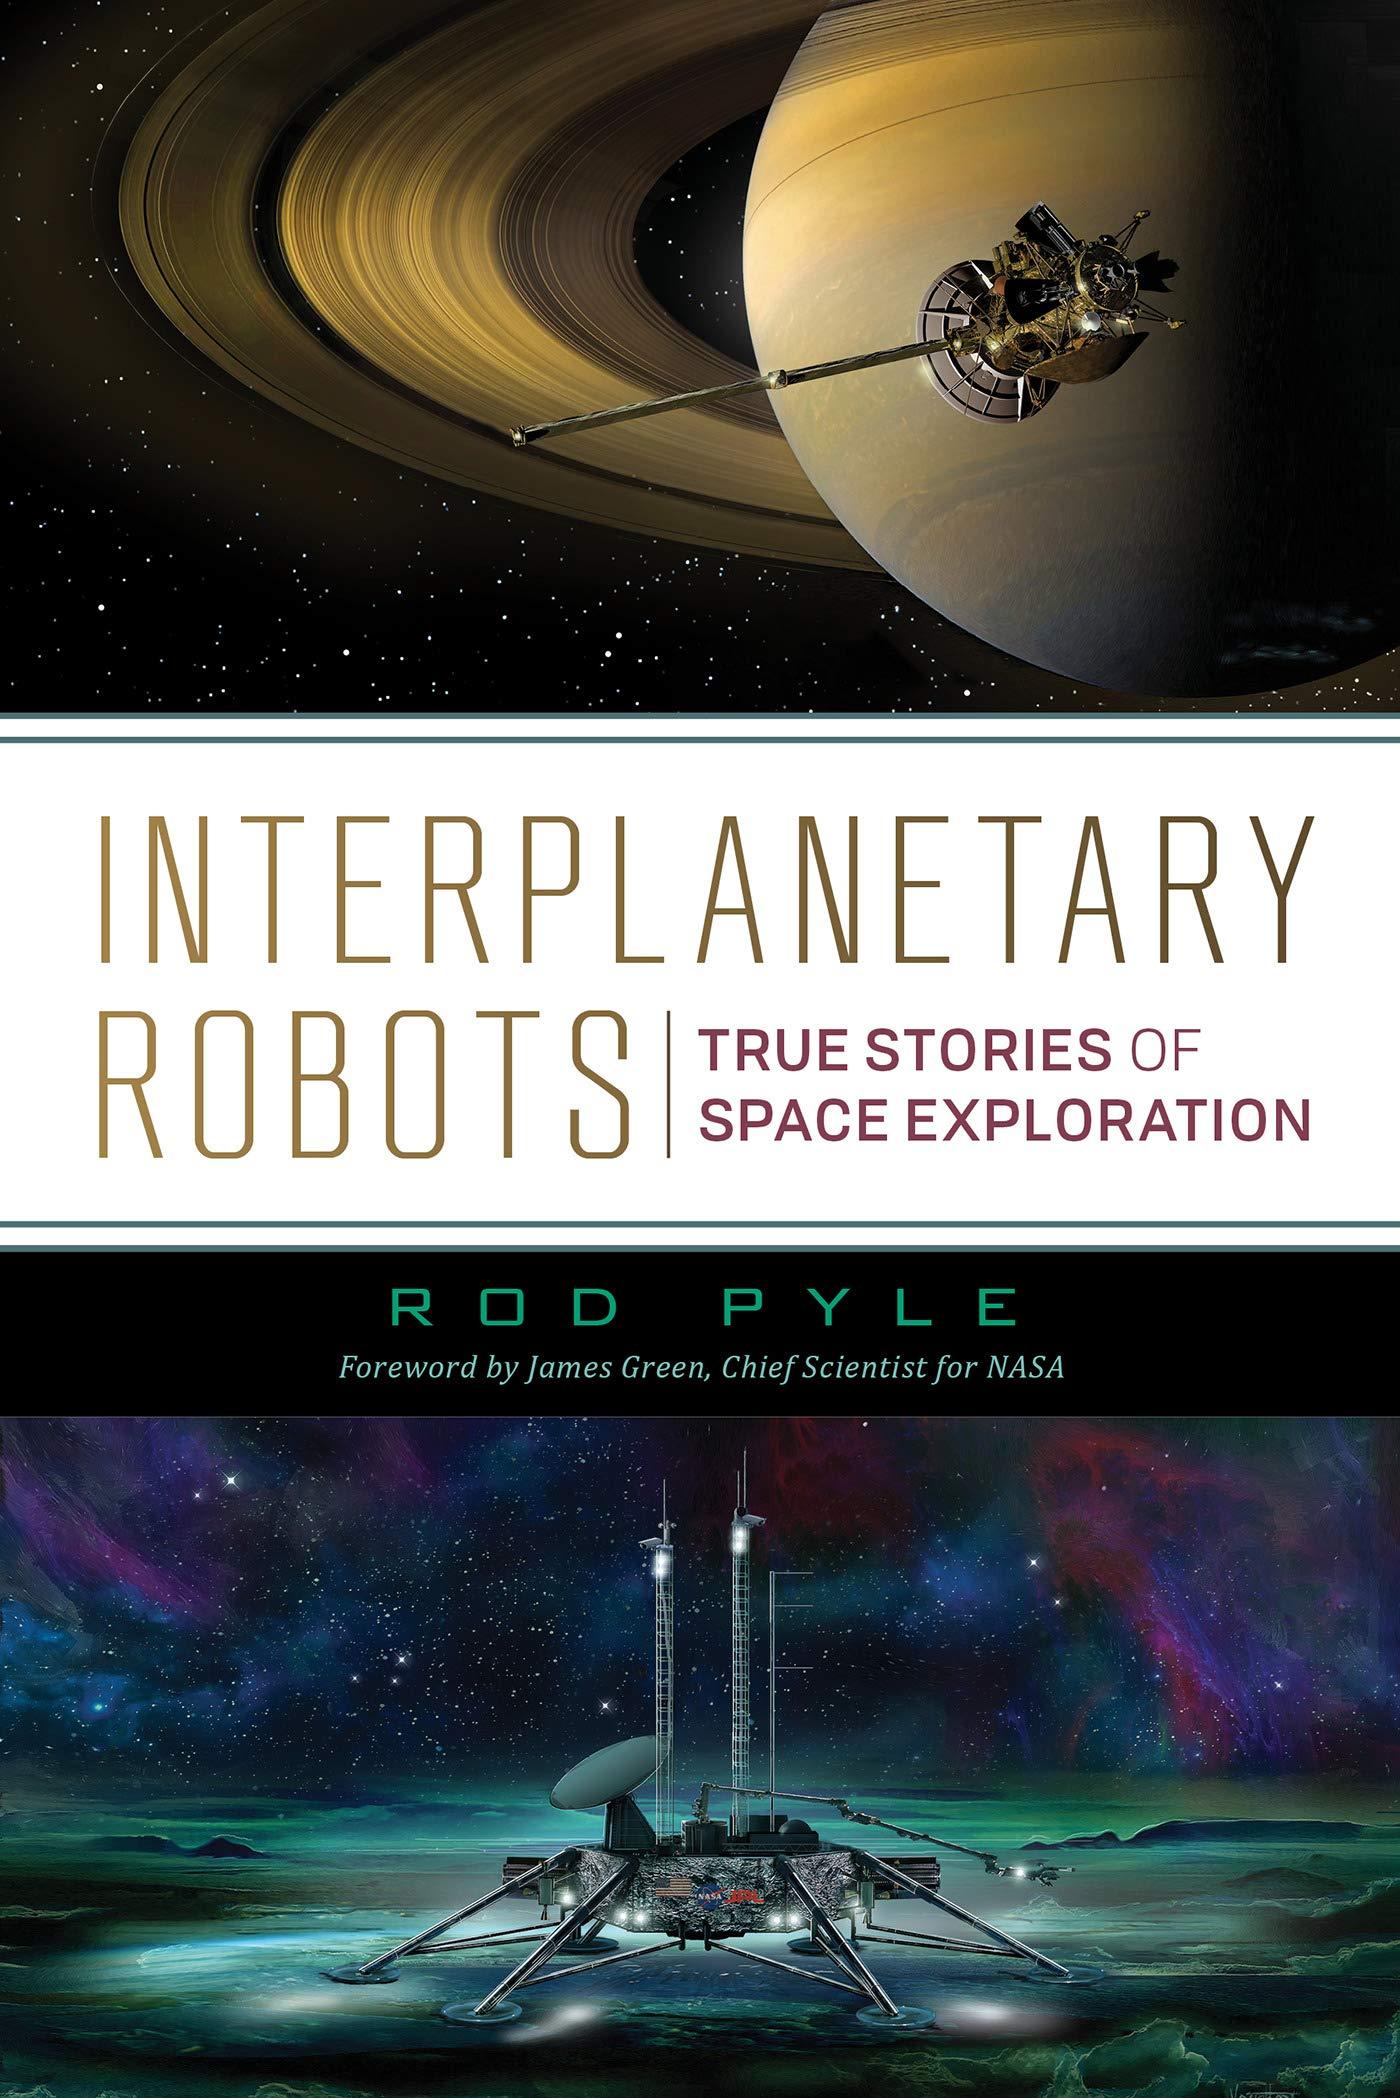 Interplanetary Robots: True Stories of Space Exploration ebook